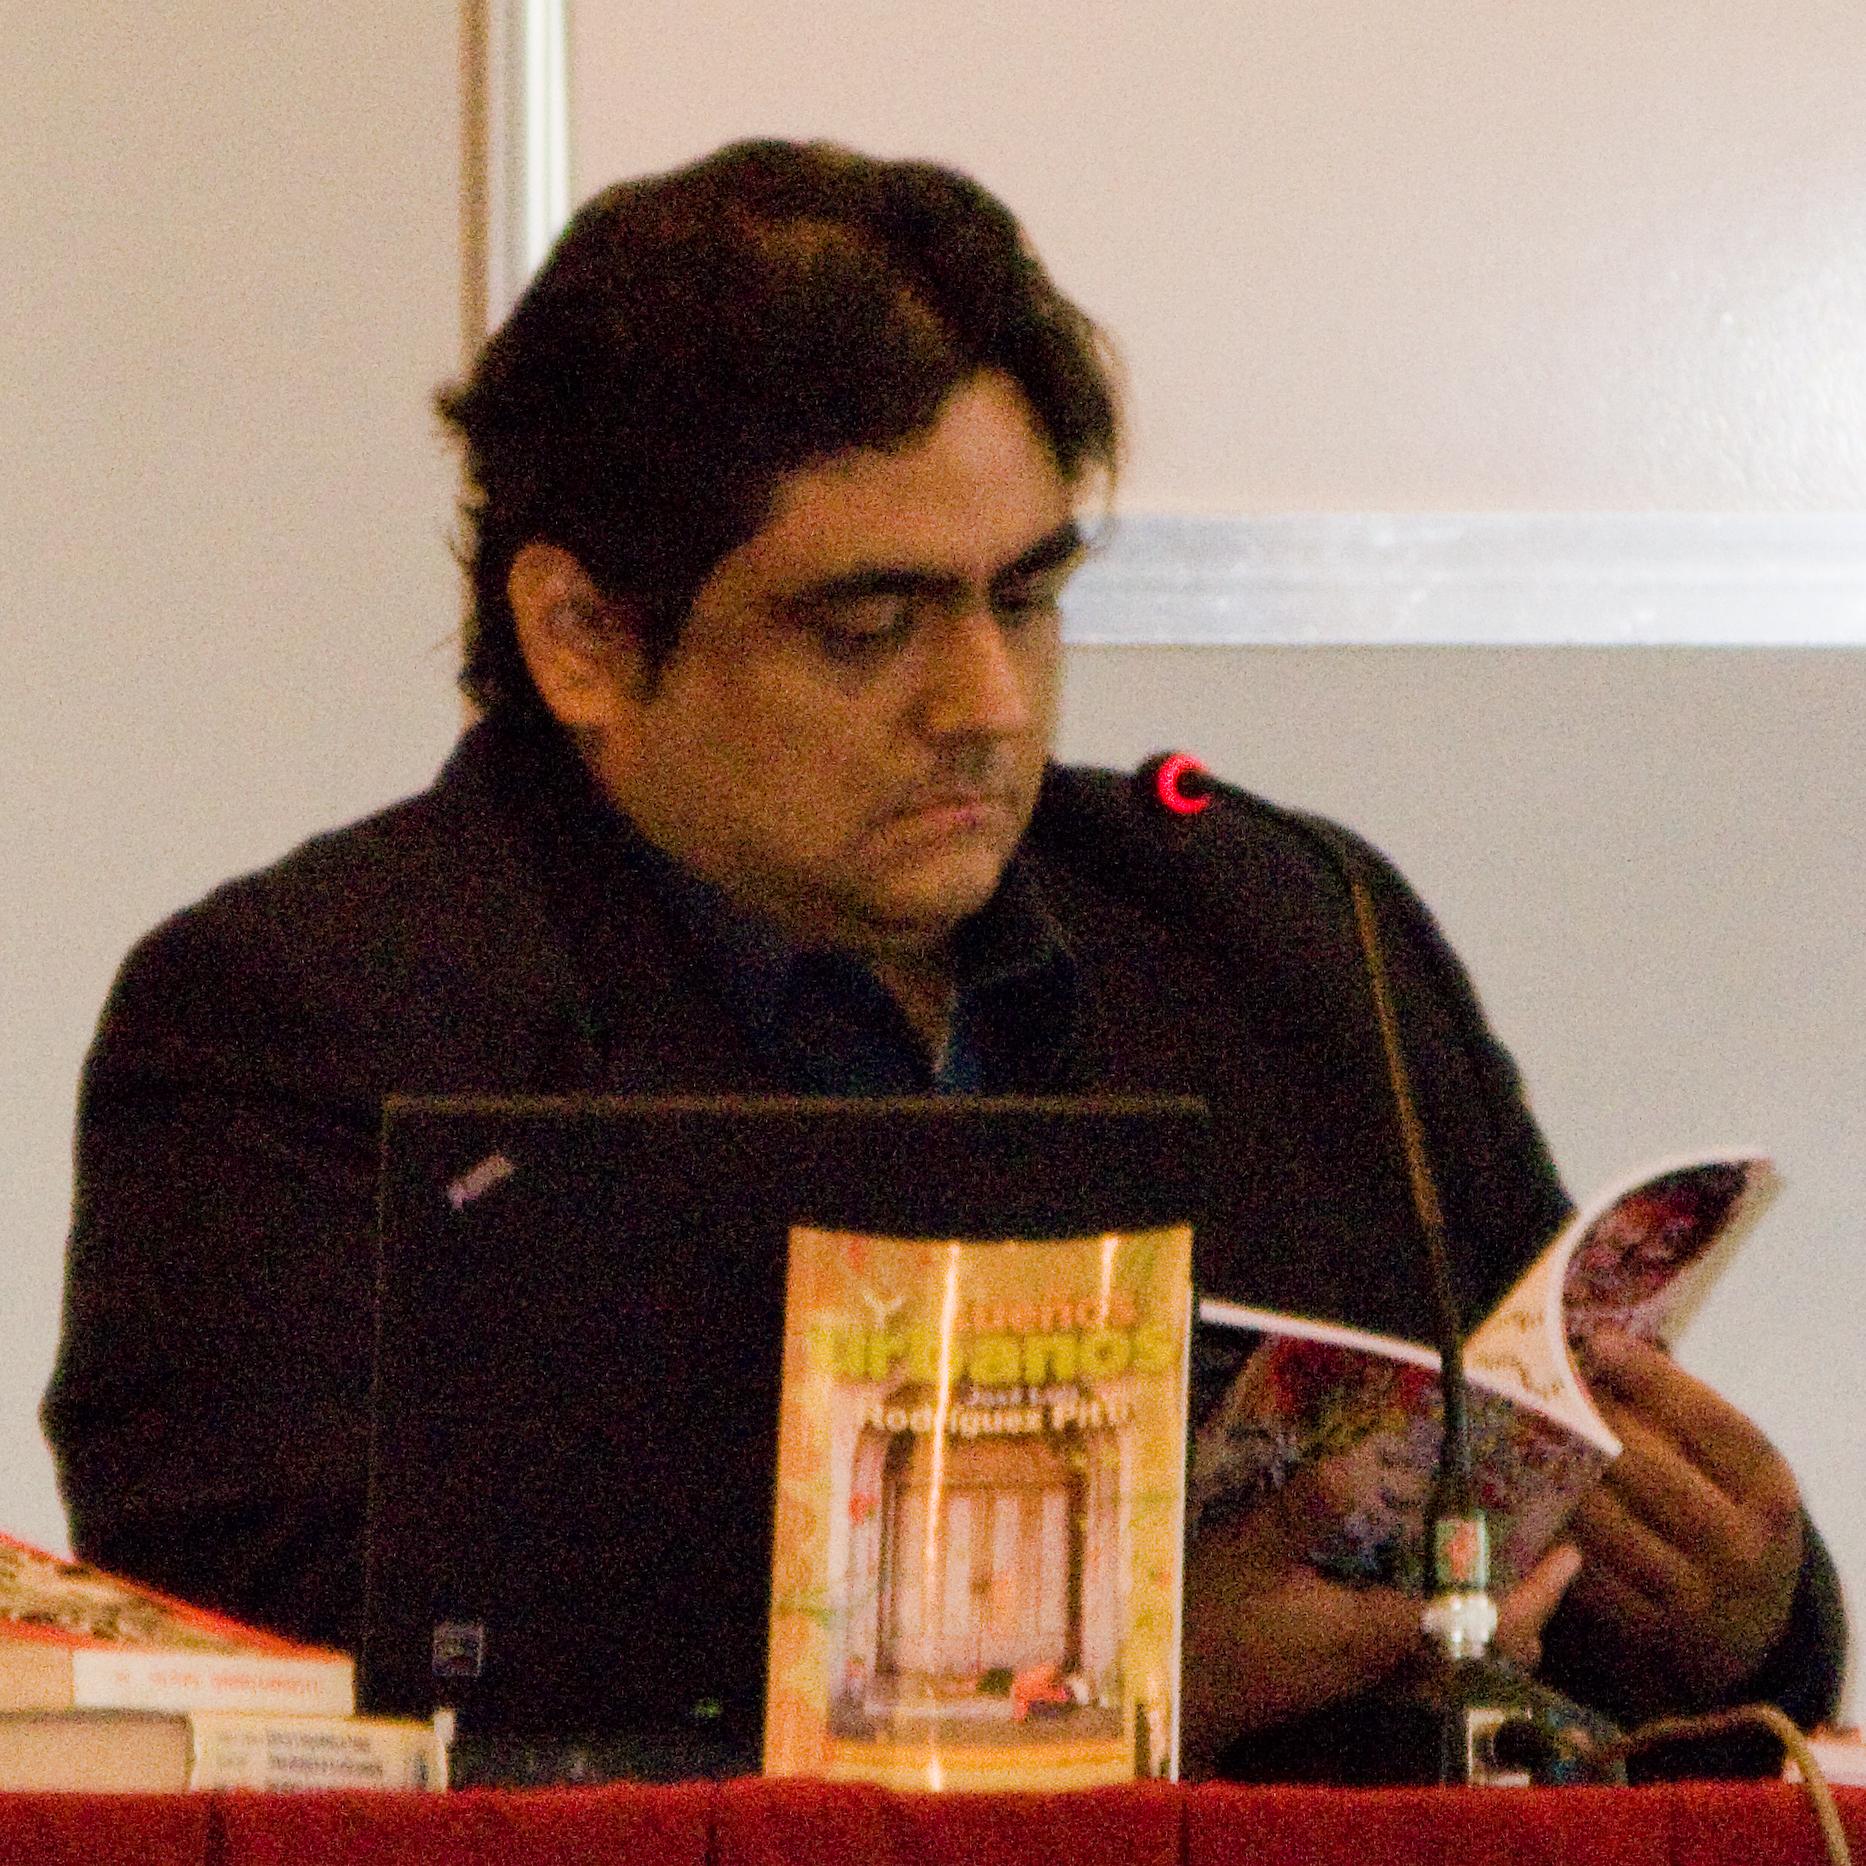 Image of José Luis Rodríguez Pittí from Wikidata